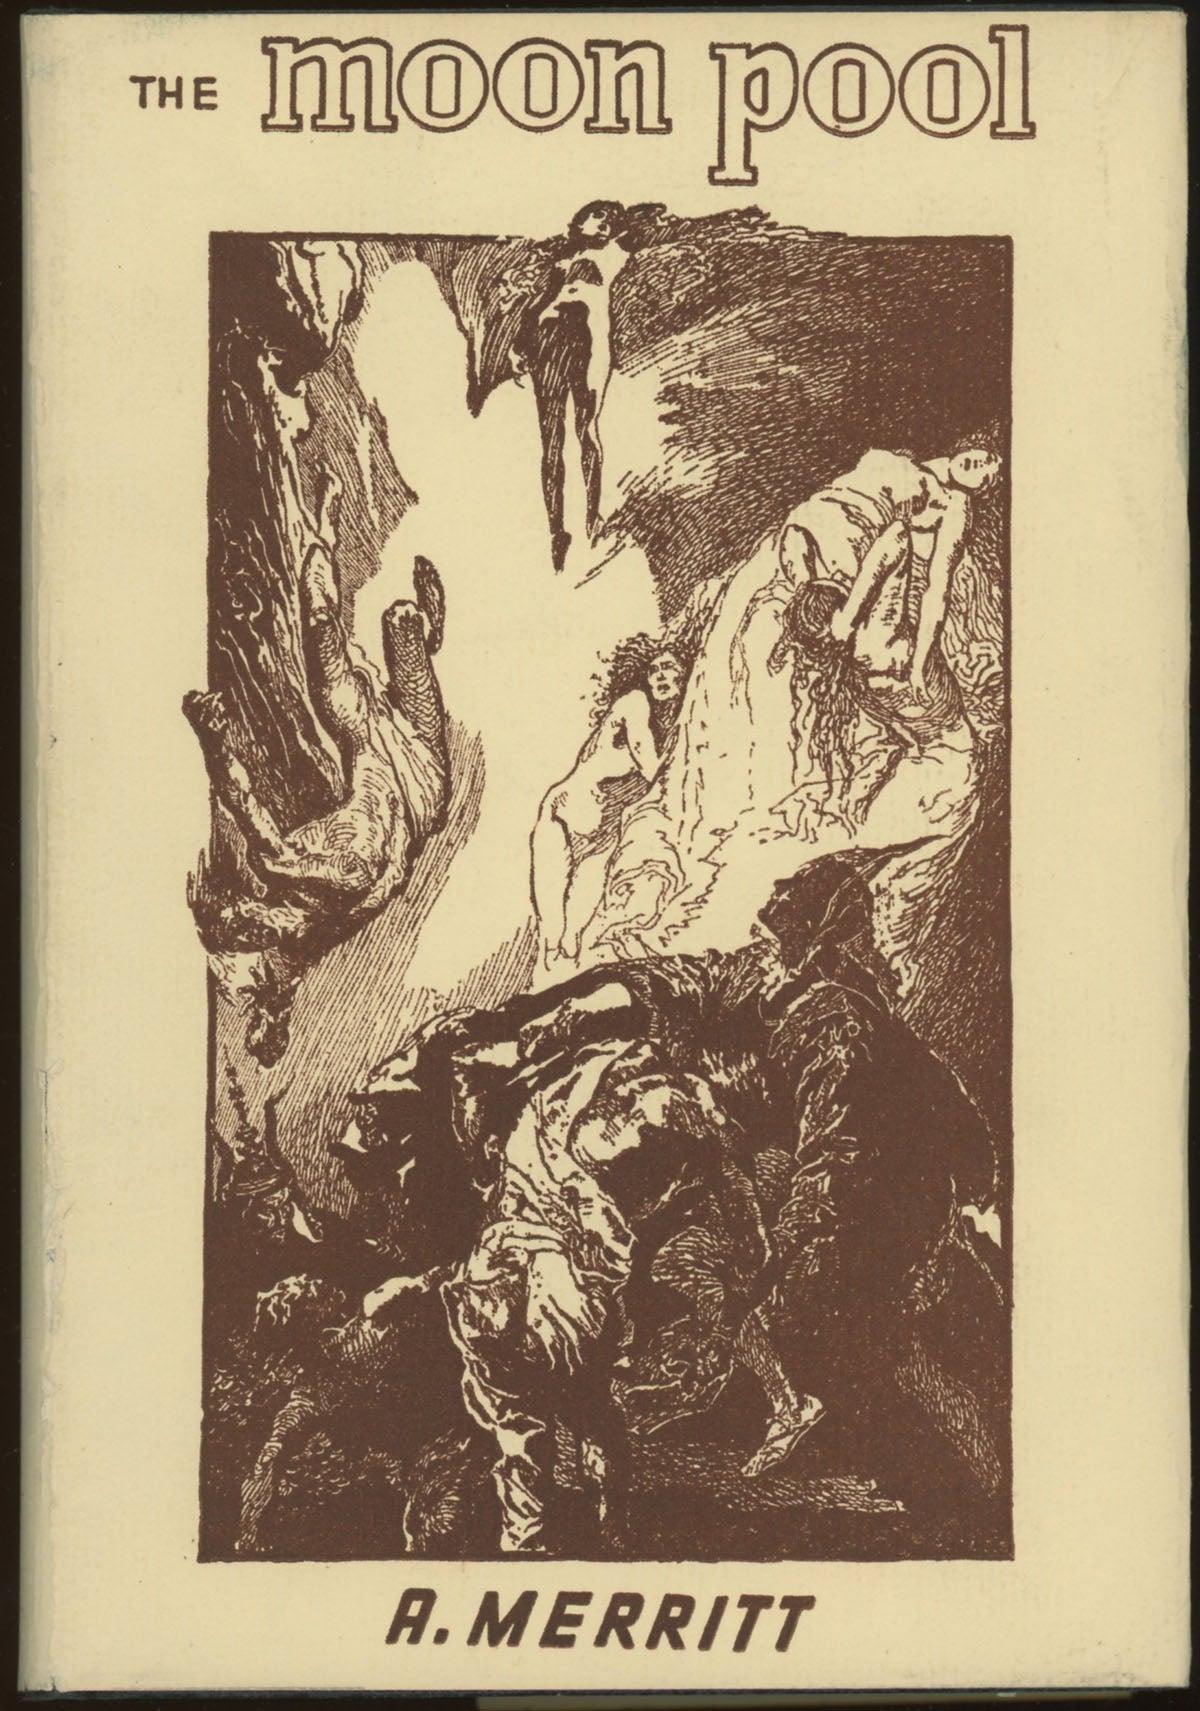 THE MOON POOL | A. Merritt | Later edition